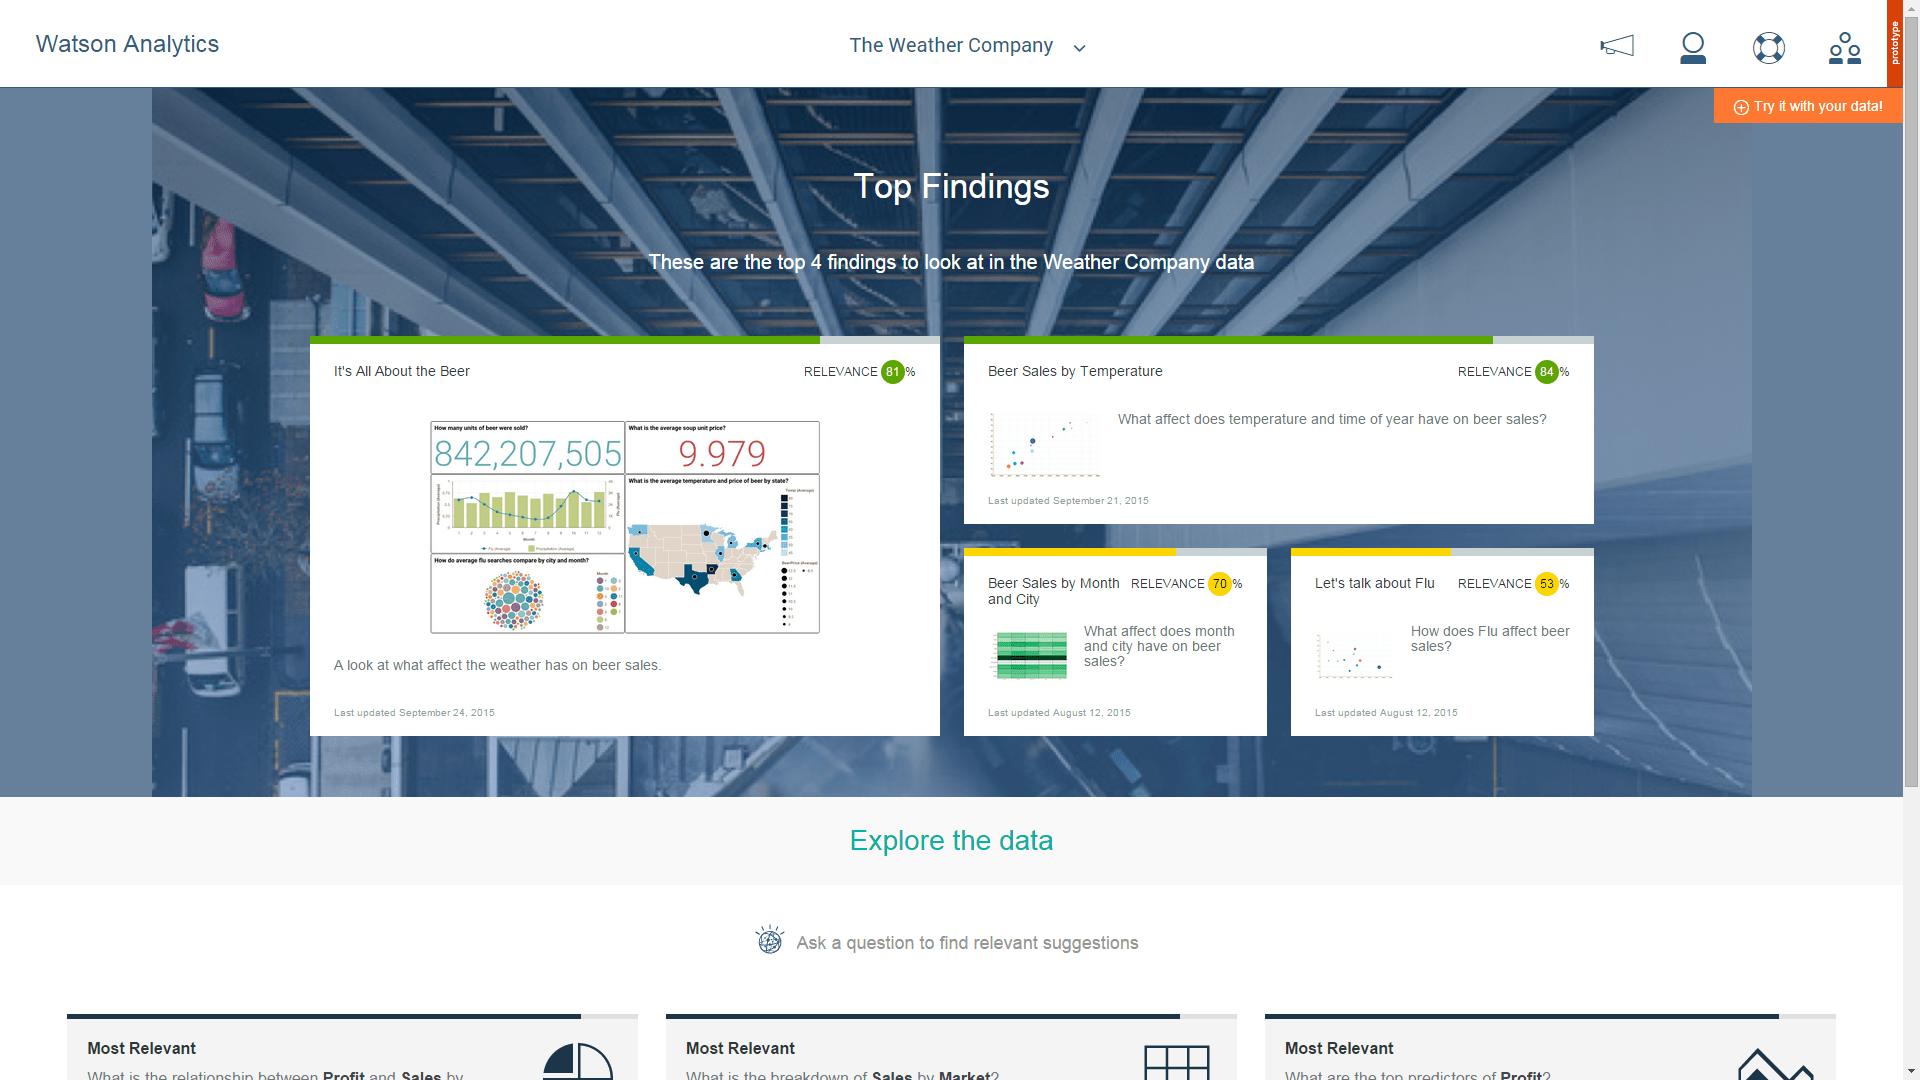 "The Weather Company ""Expert Playbook"" in IBM's Watson Analytics."